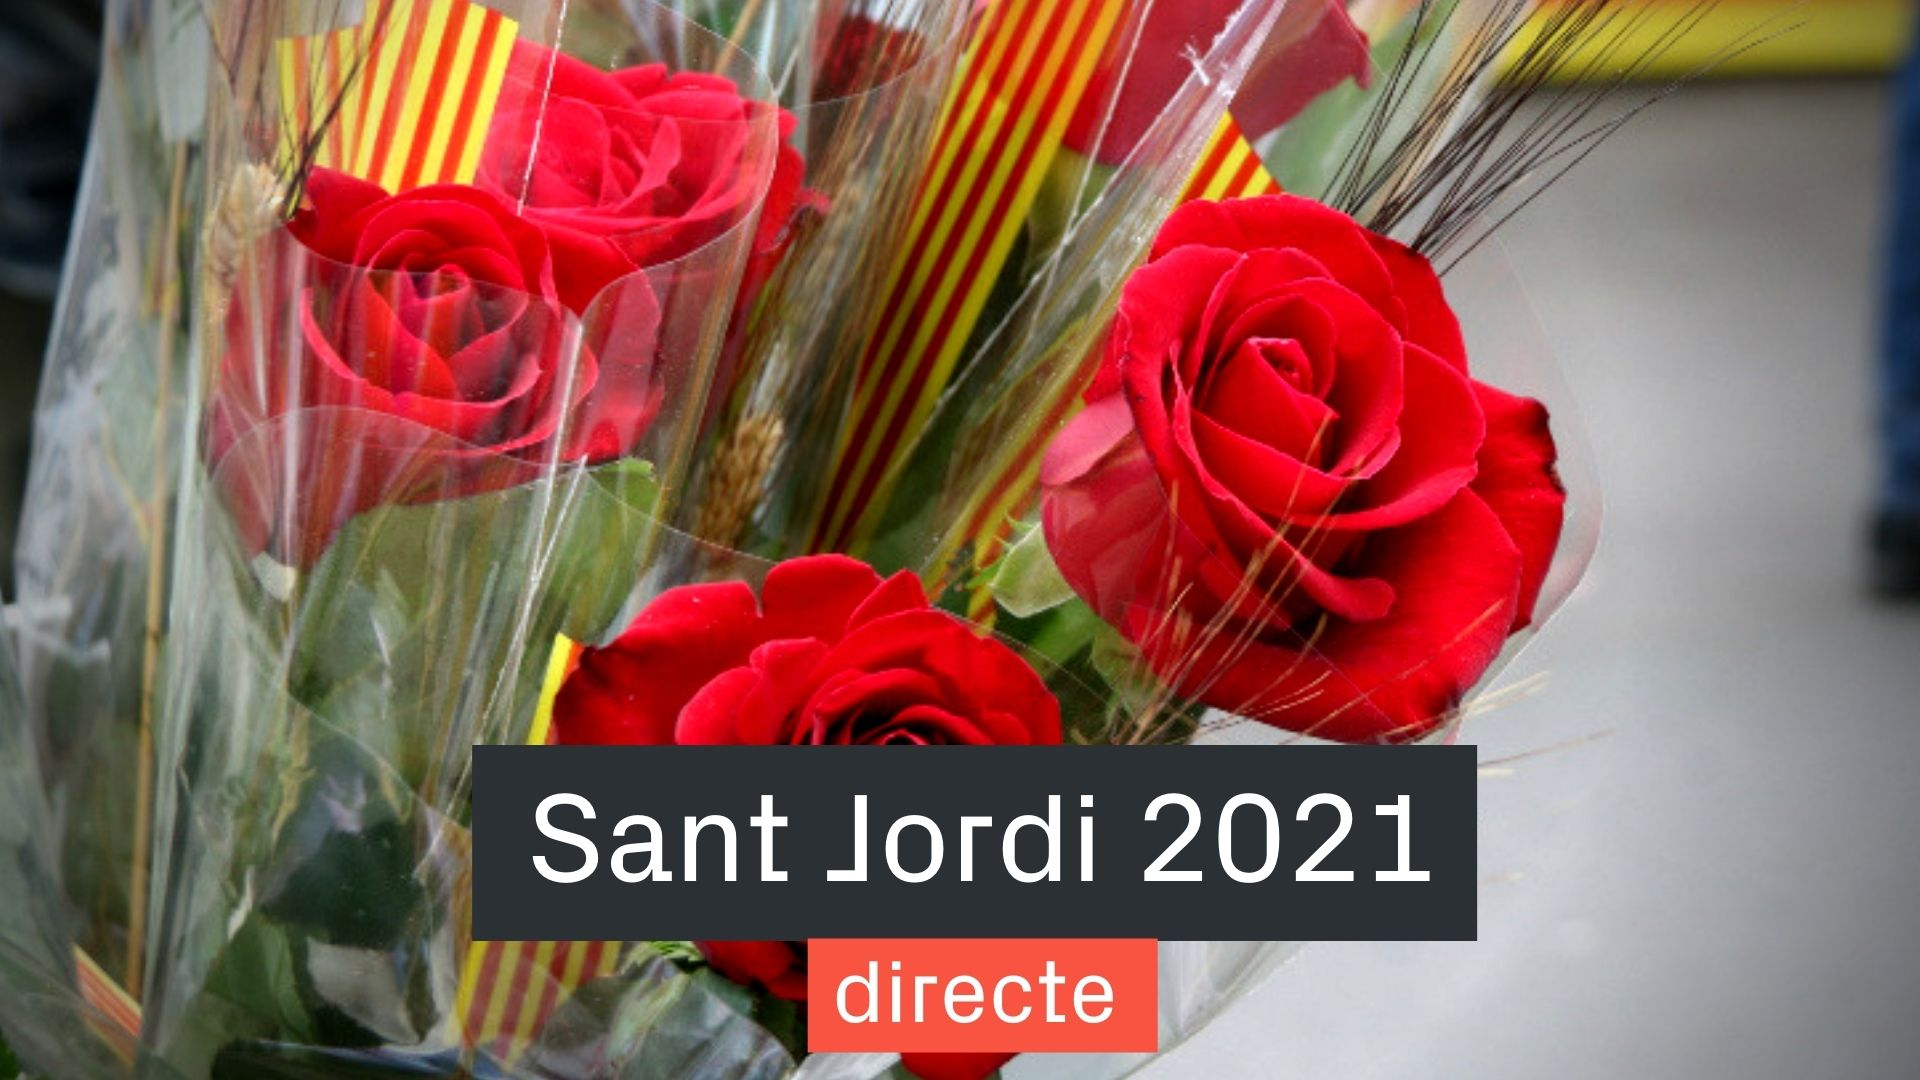 sant jordi 2021 directe